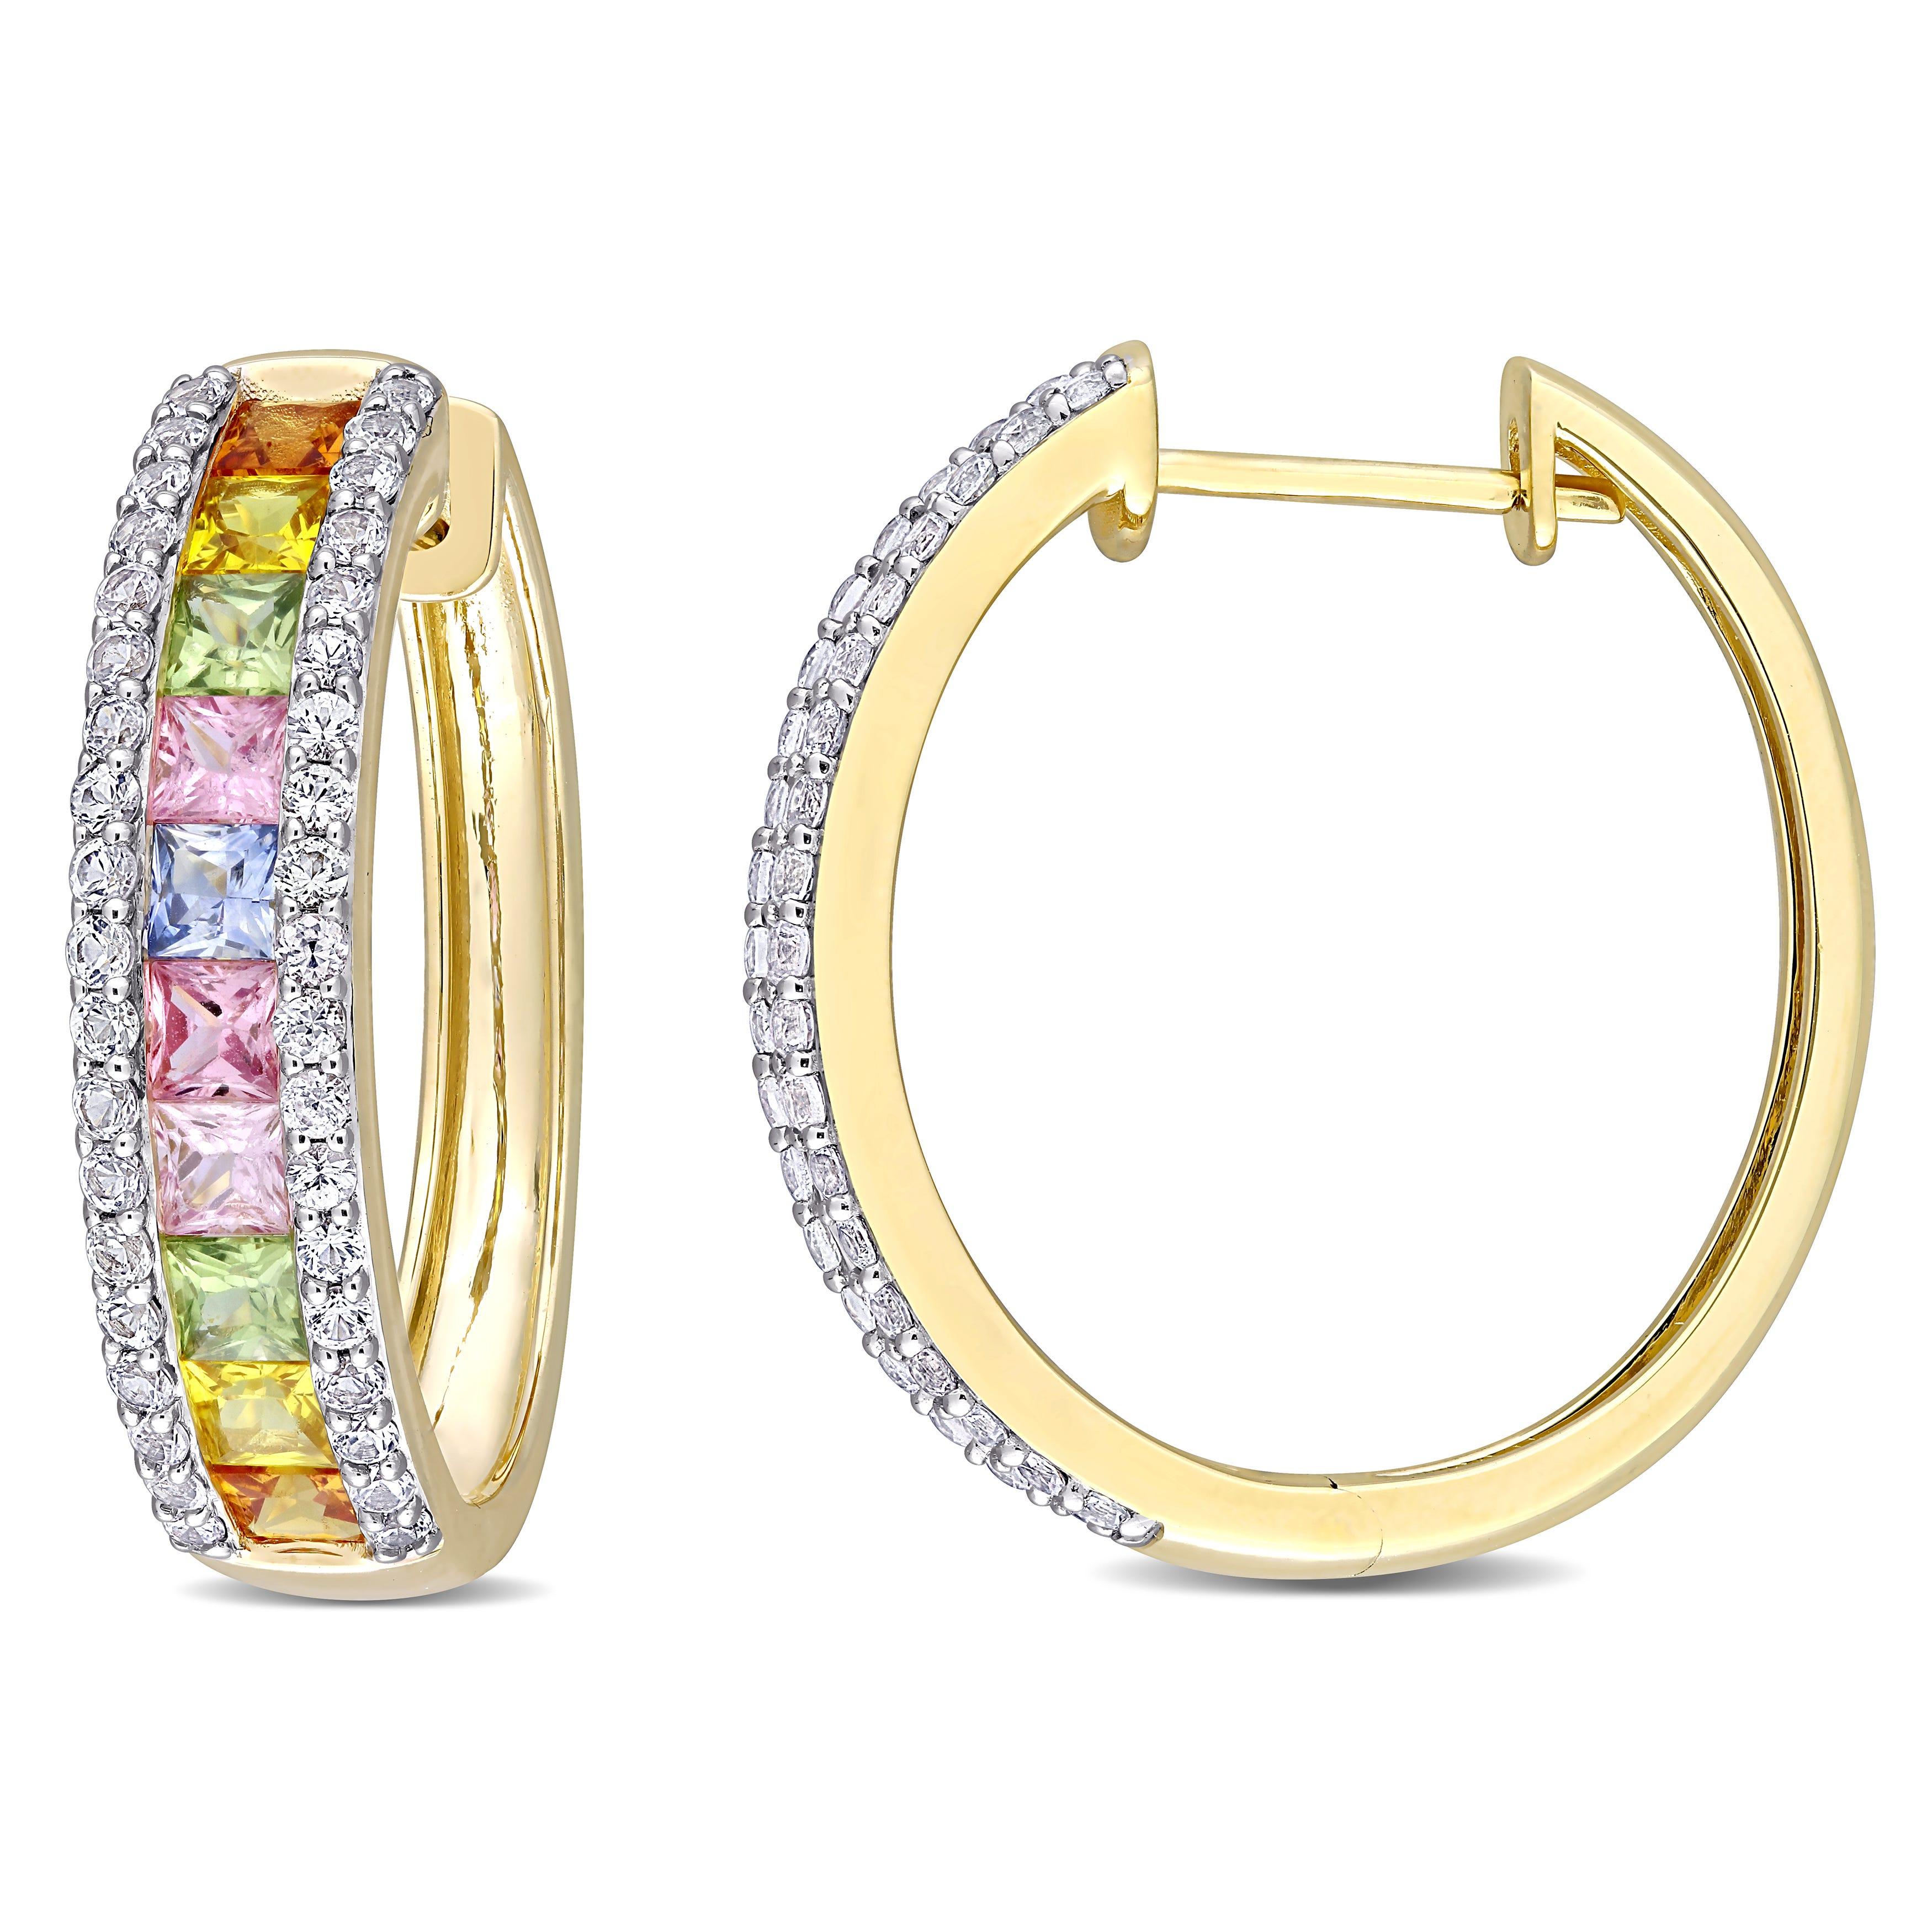 Rainbow Created Shire Hoop Earrings In 14k Yellow Gold